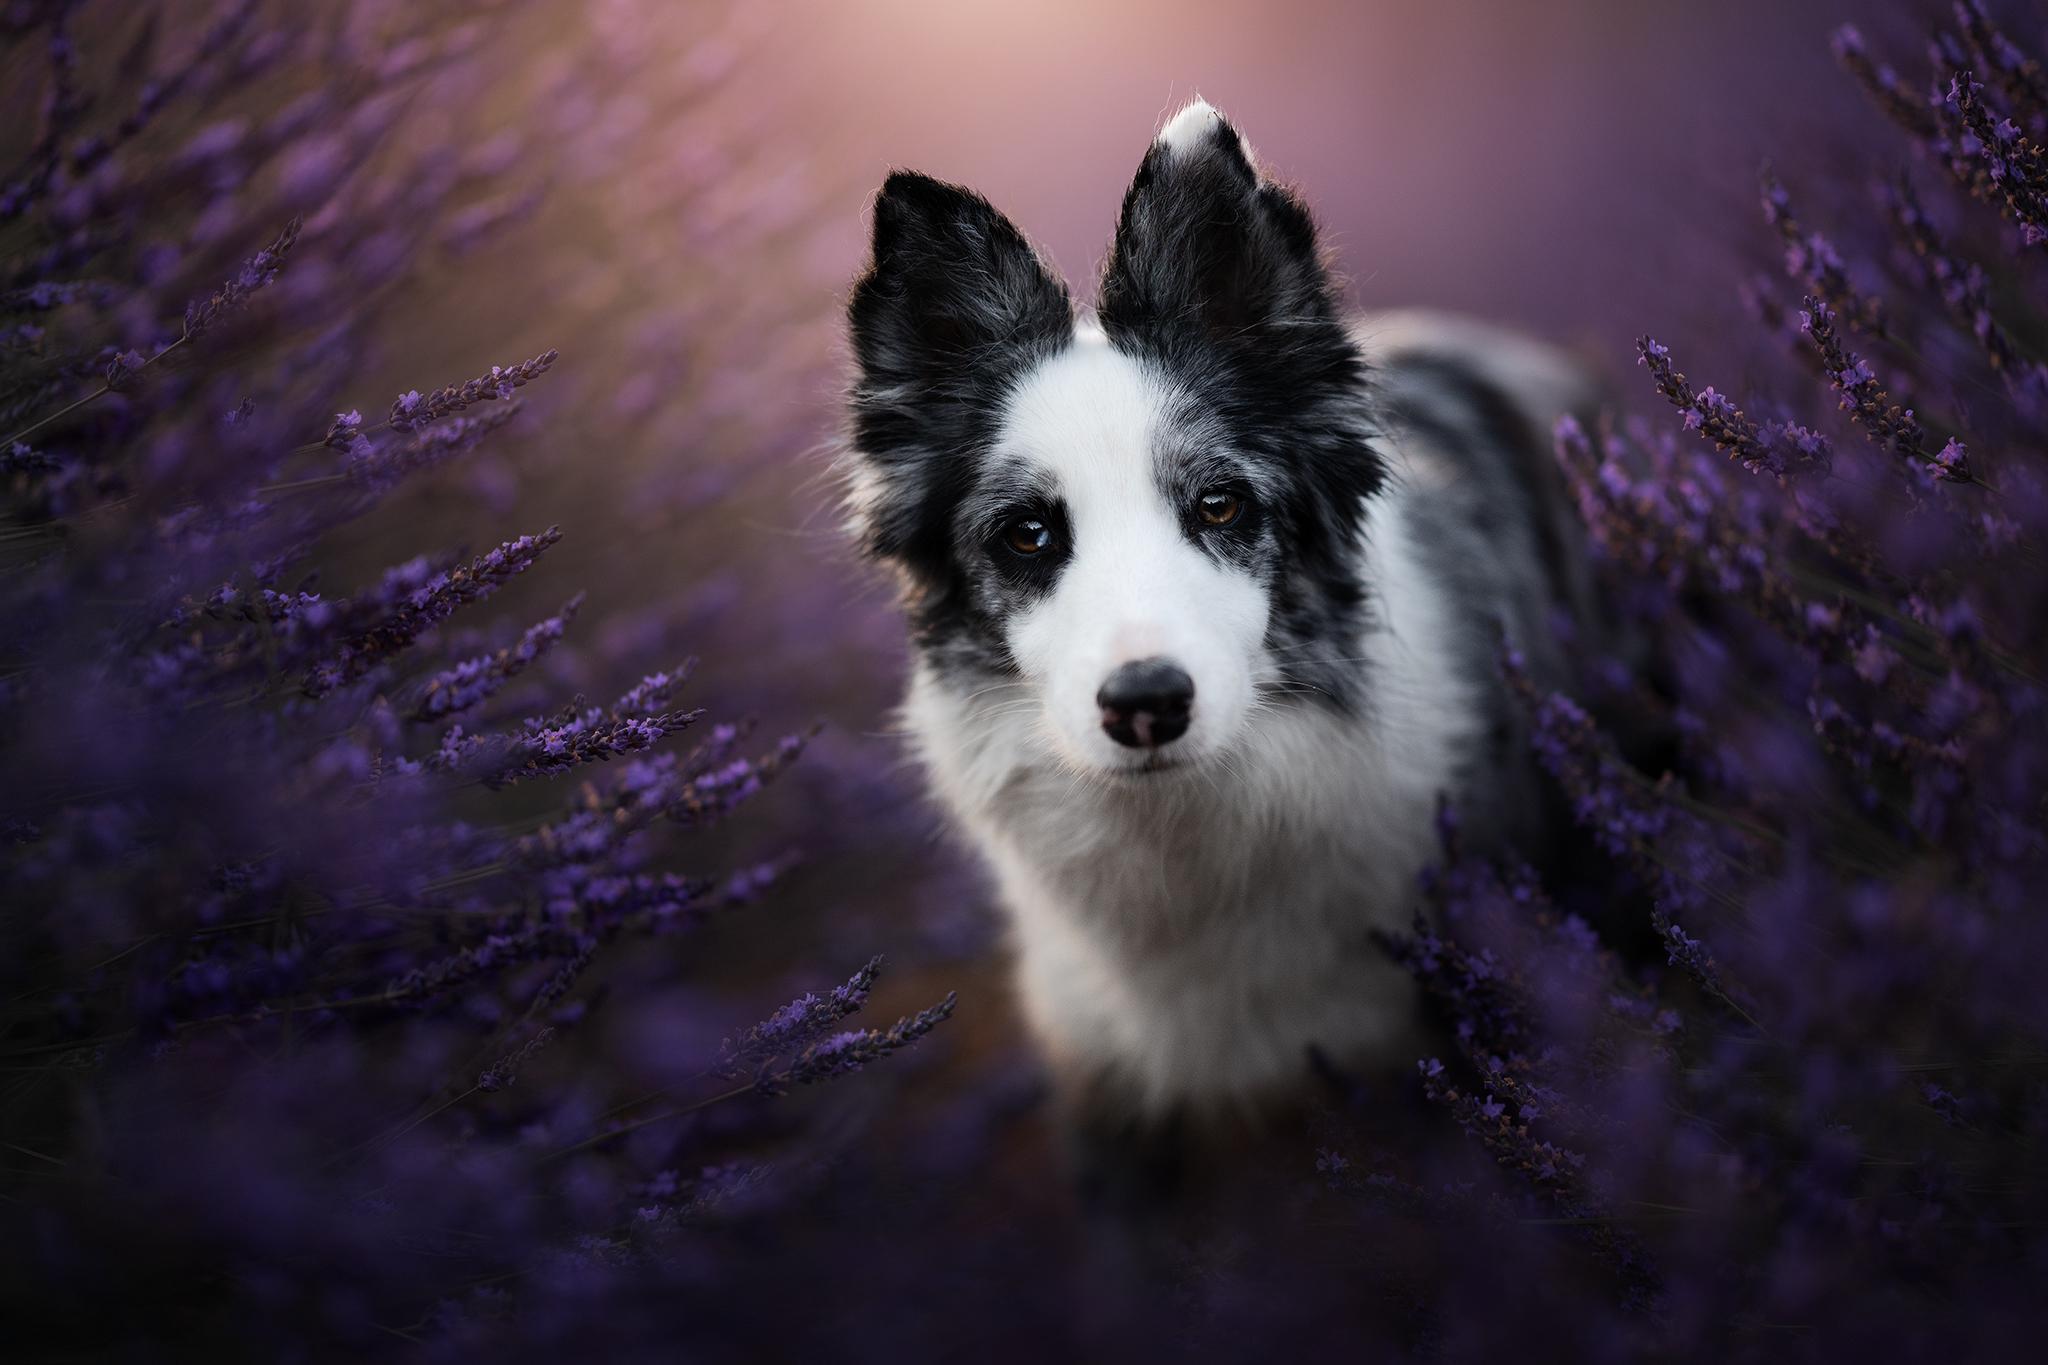 Audrey Bellot Photographe Canin France Belgique Dog Photography Workshop Portraits of Dogs and Art